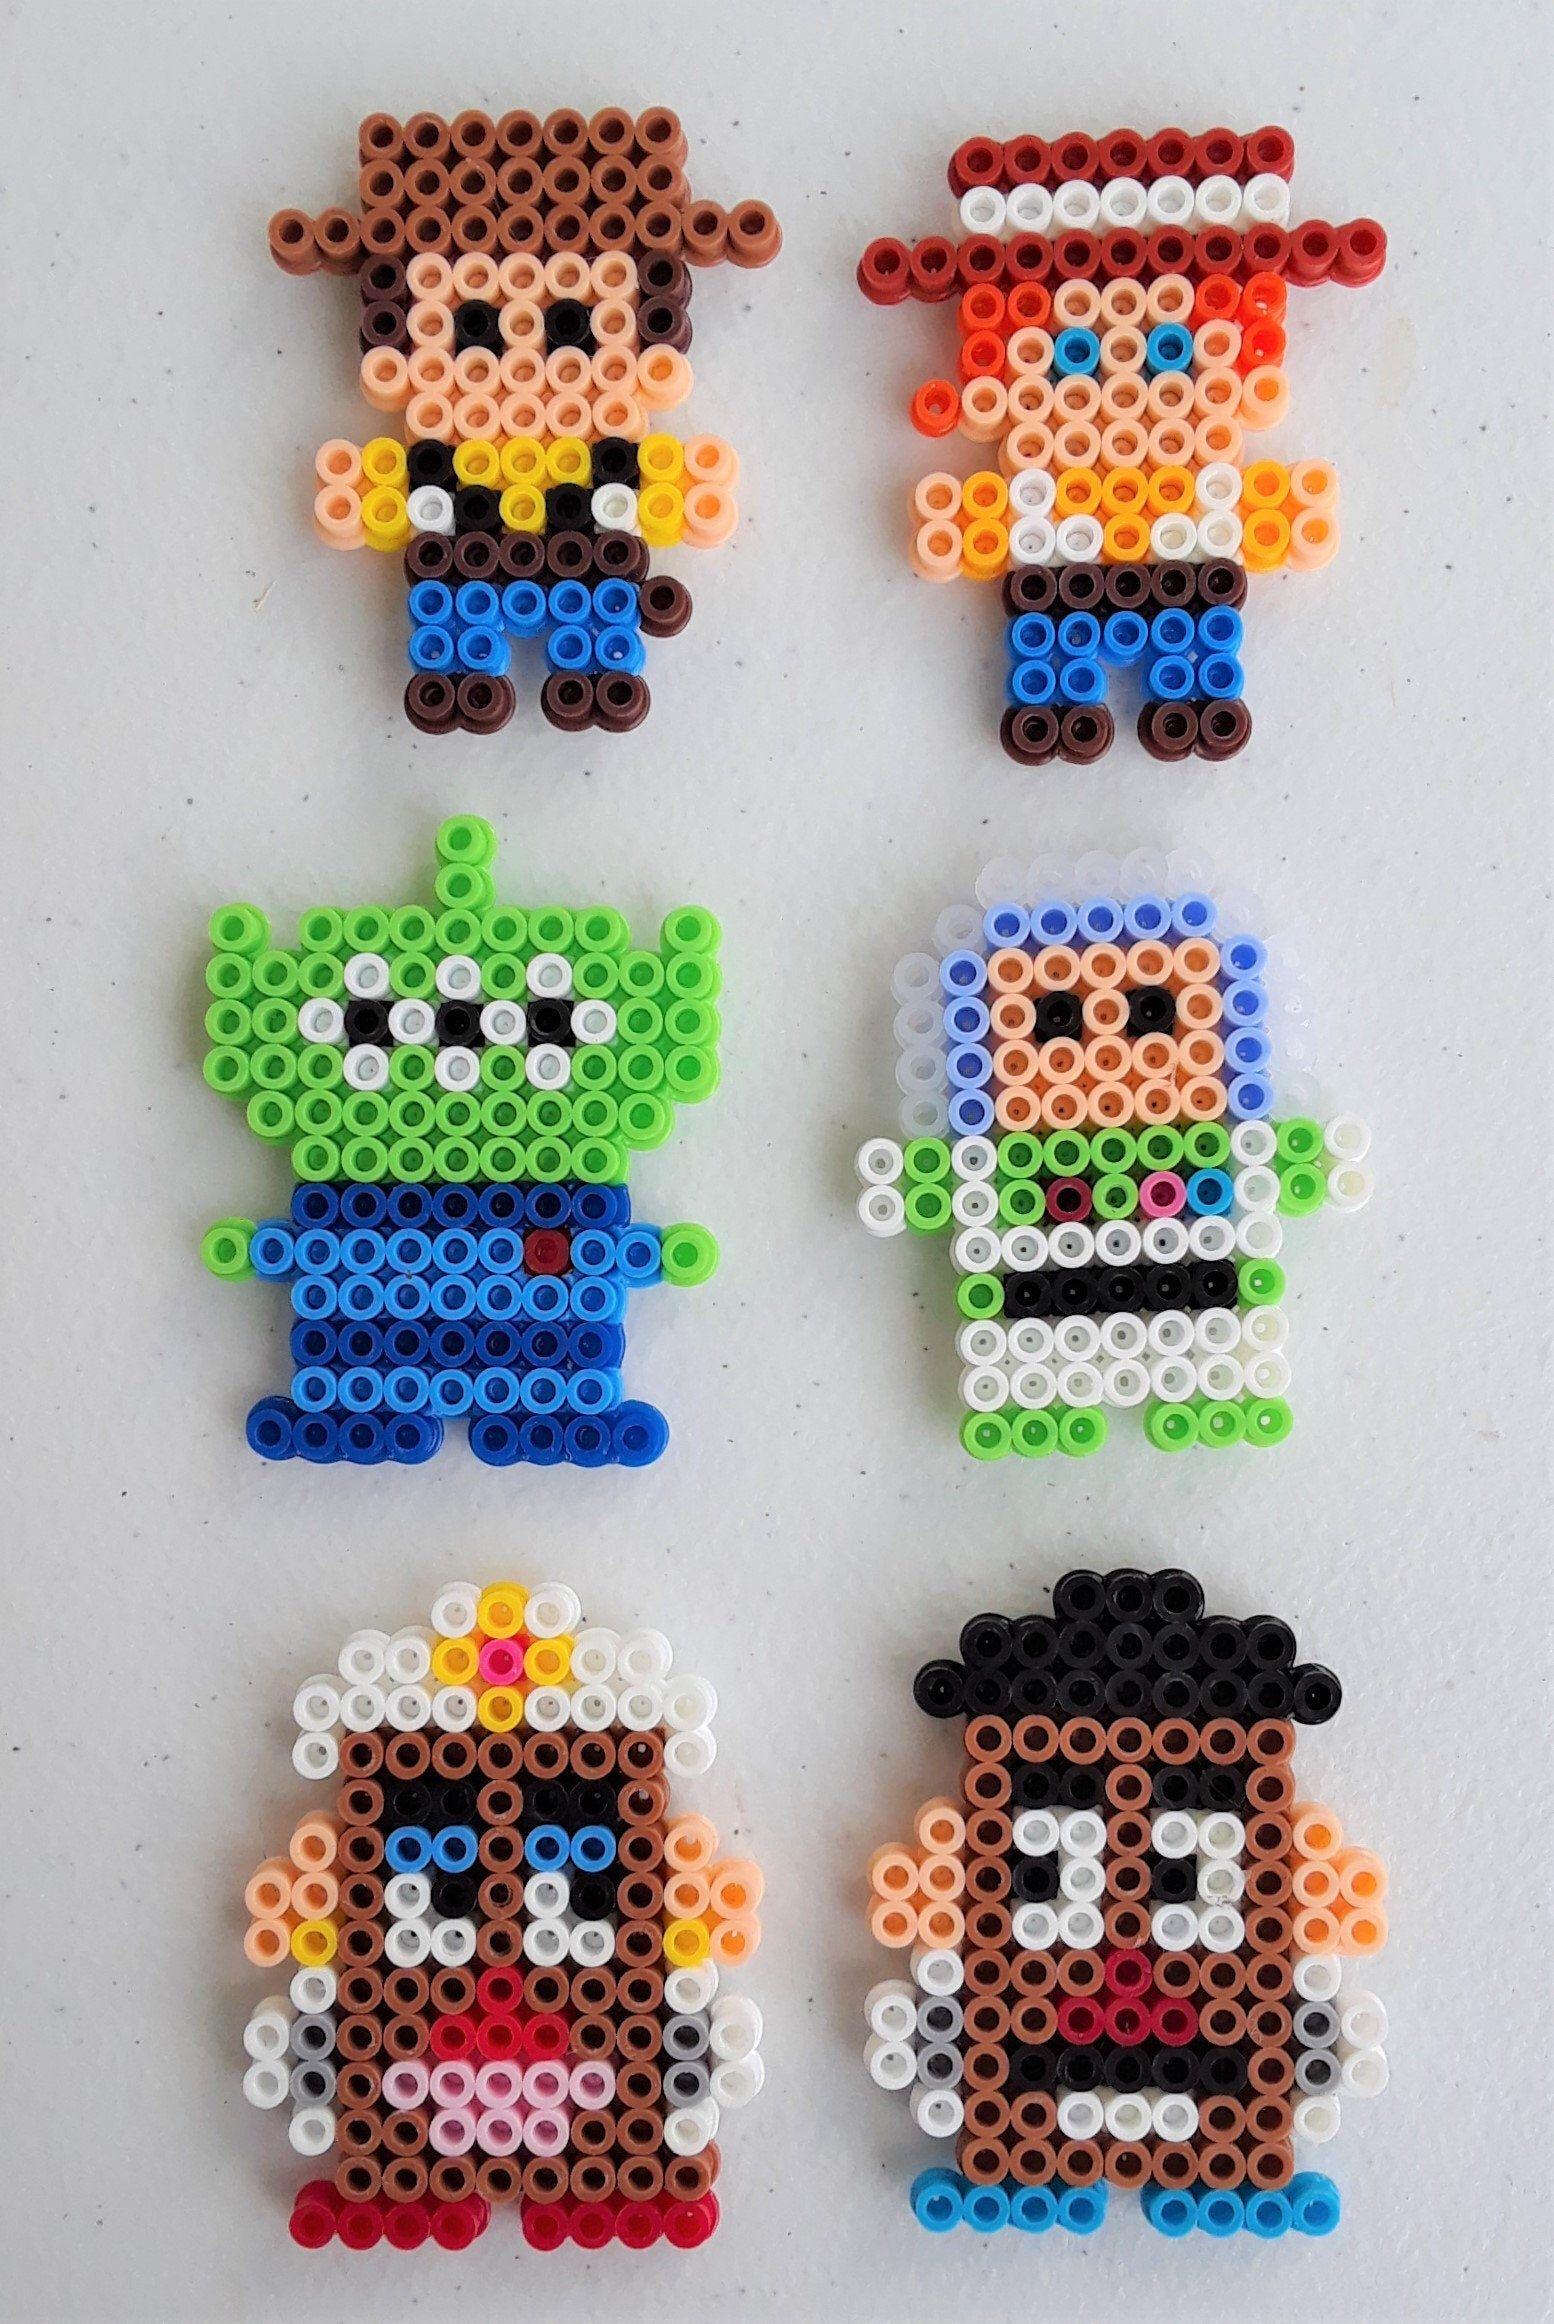 Disney Pixar S Toy Story Character Perler Bead Magnets Perler Bead Disney Hama Beads Patterns Easy Perler Bead Patterns